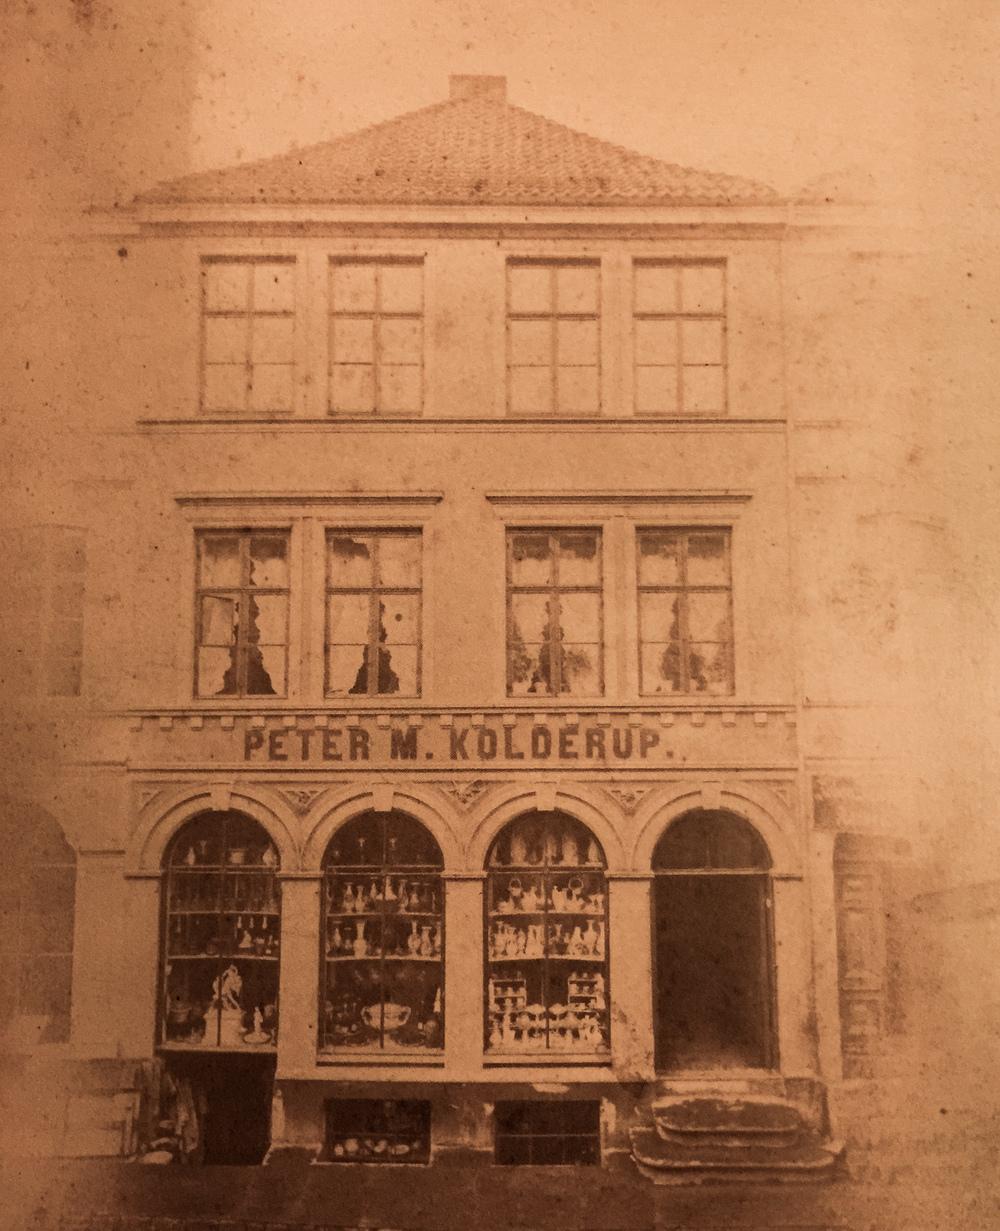 Peter M. Kolderup Store at Strandgaten, Bergen located in the western part of Norway (1860)